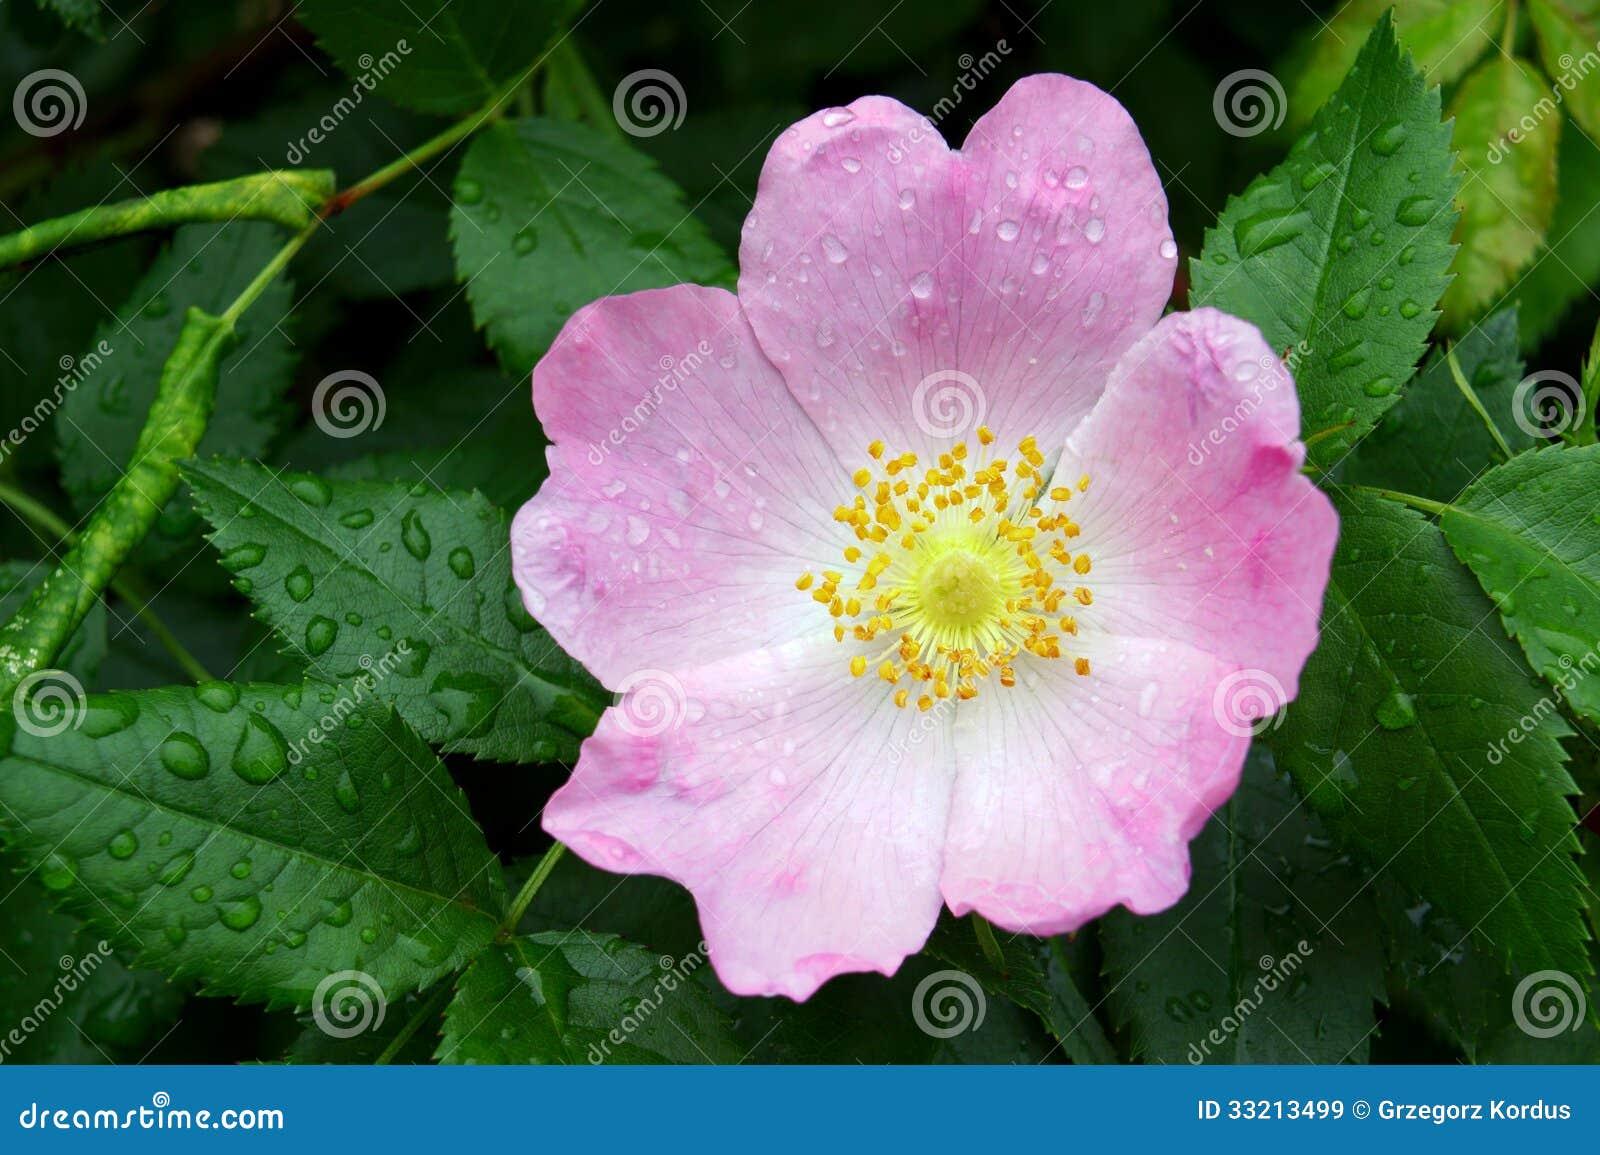 Wild Rose Royalty Free Stock Images - Image: 33213499